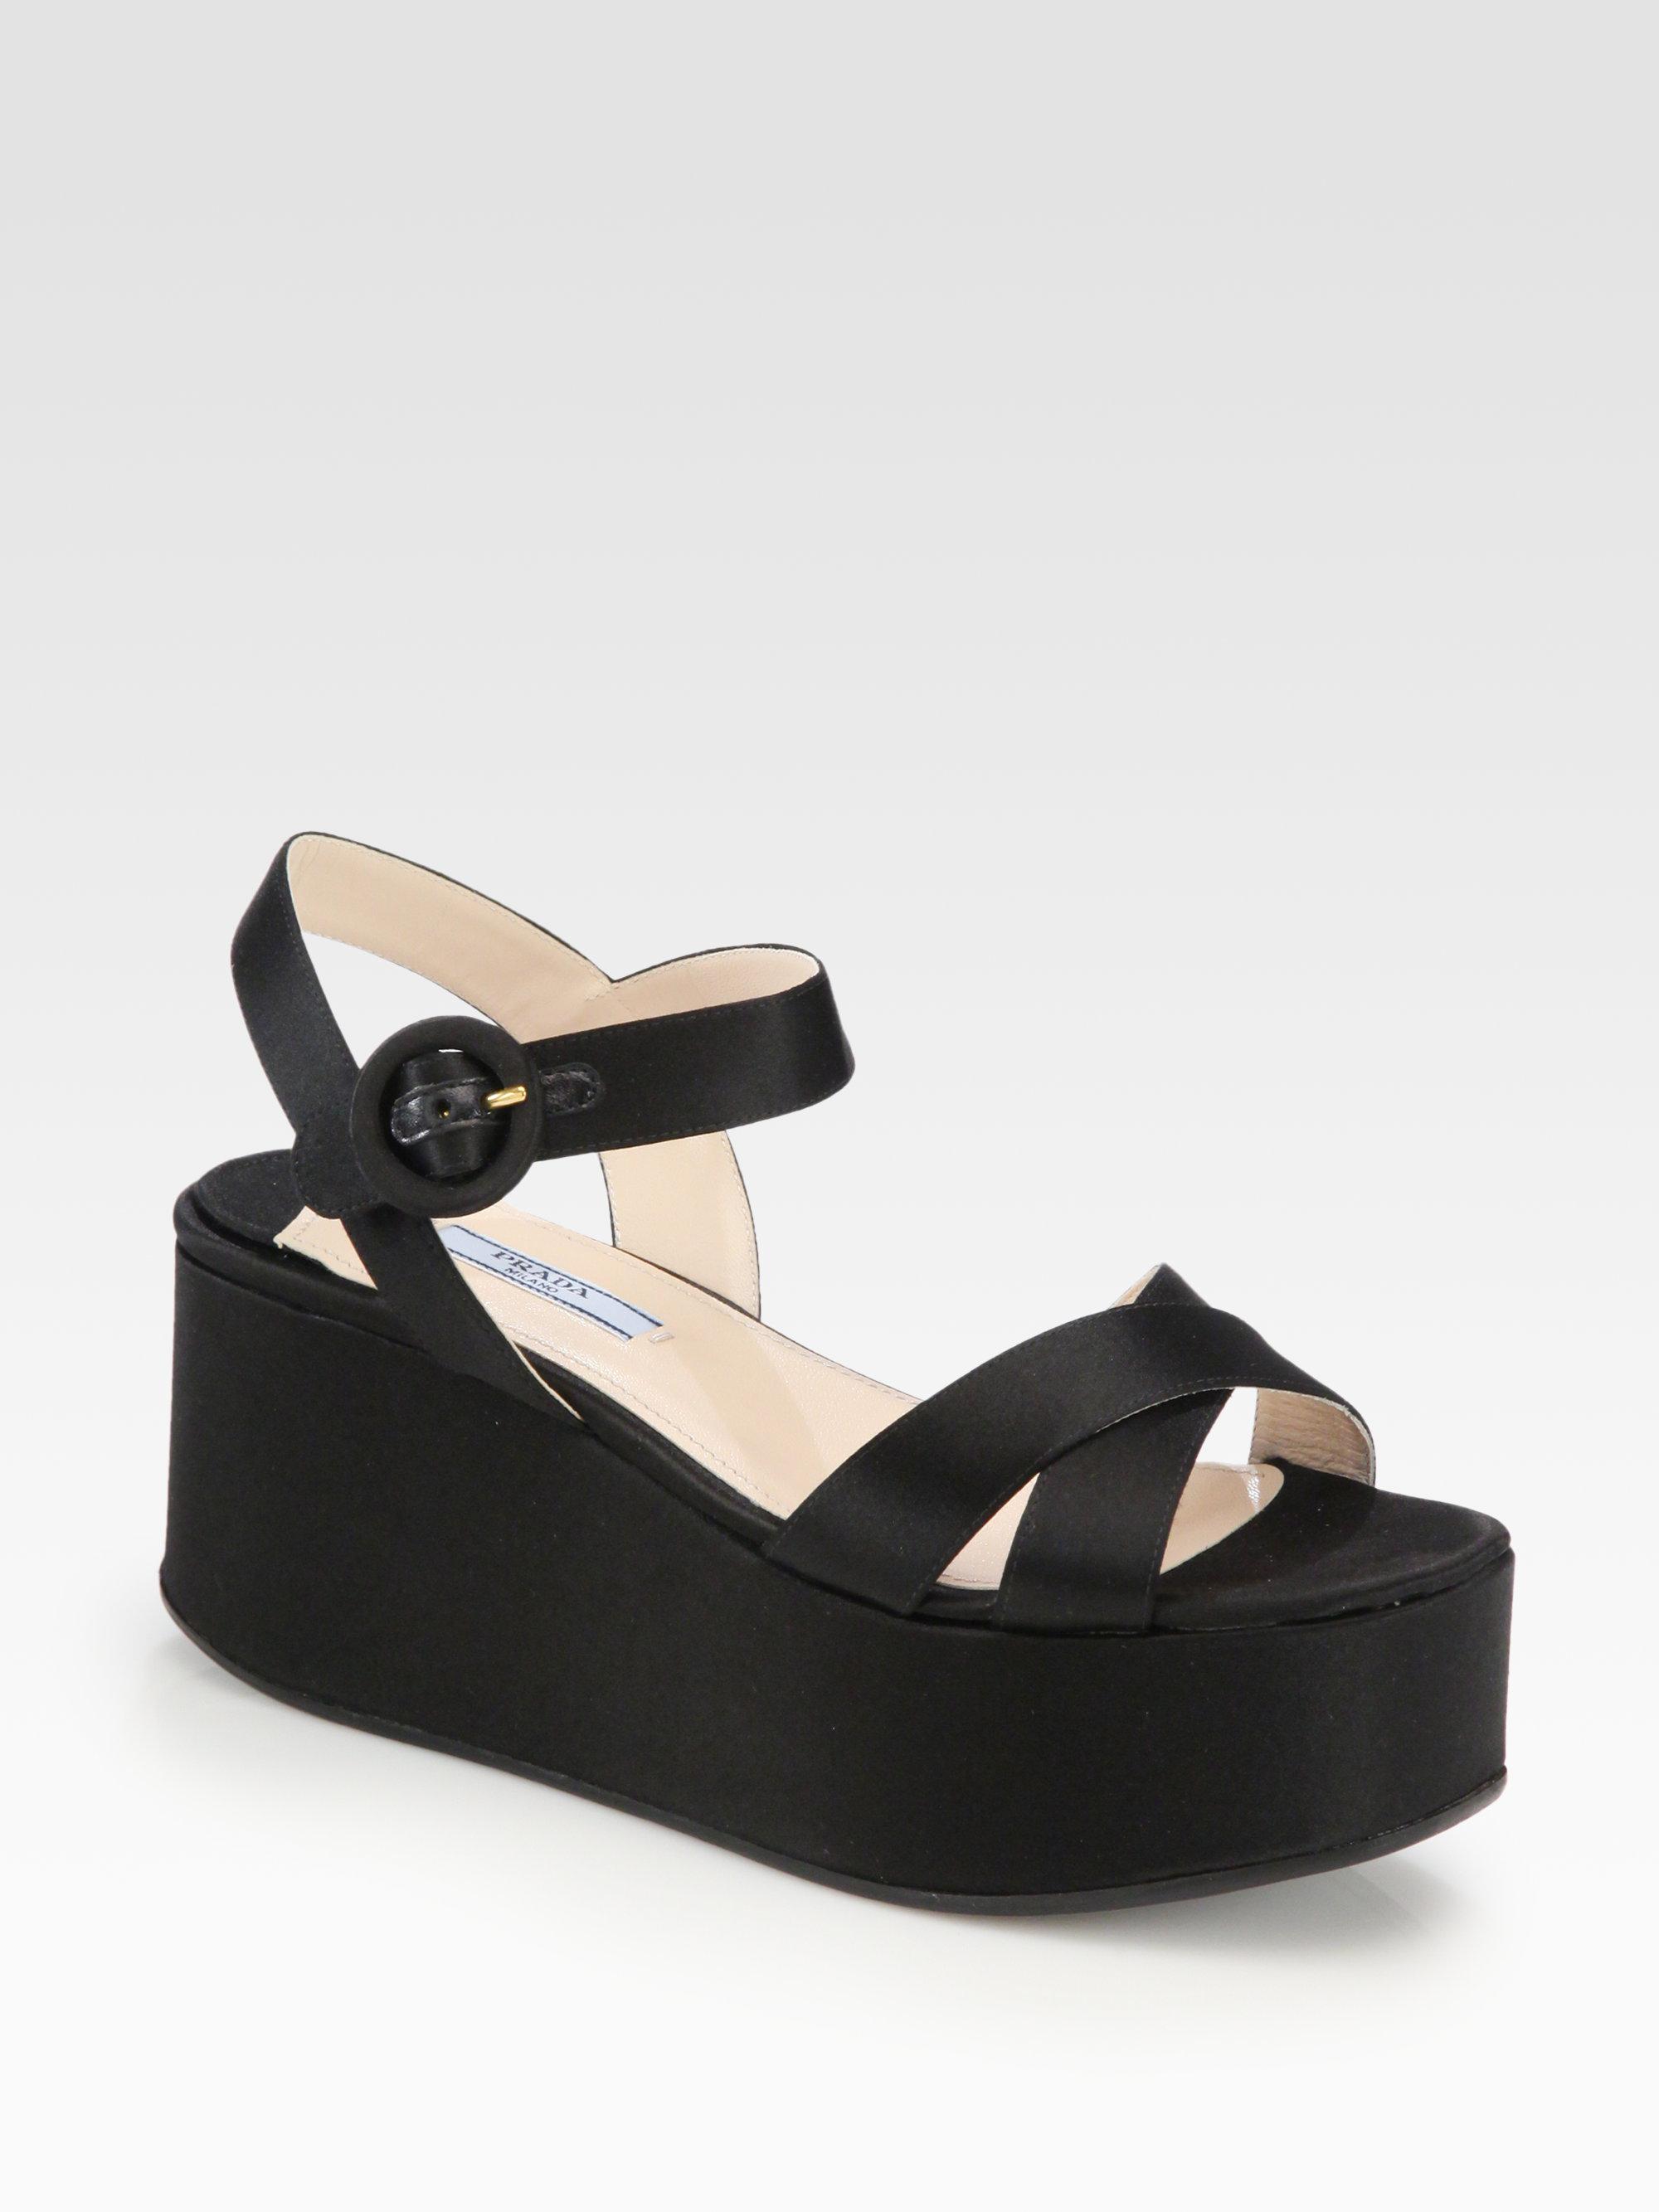 prada satin platform wedge sandals in black nero black